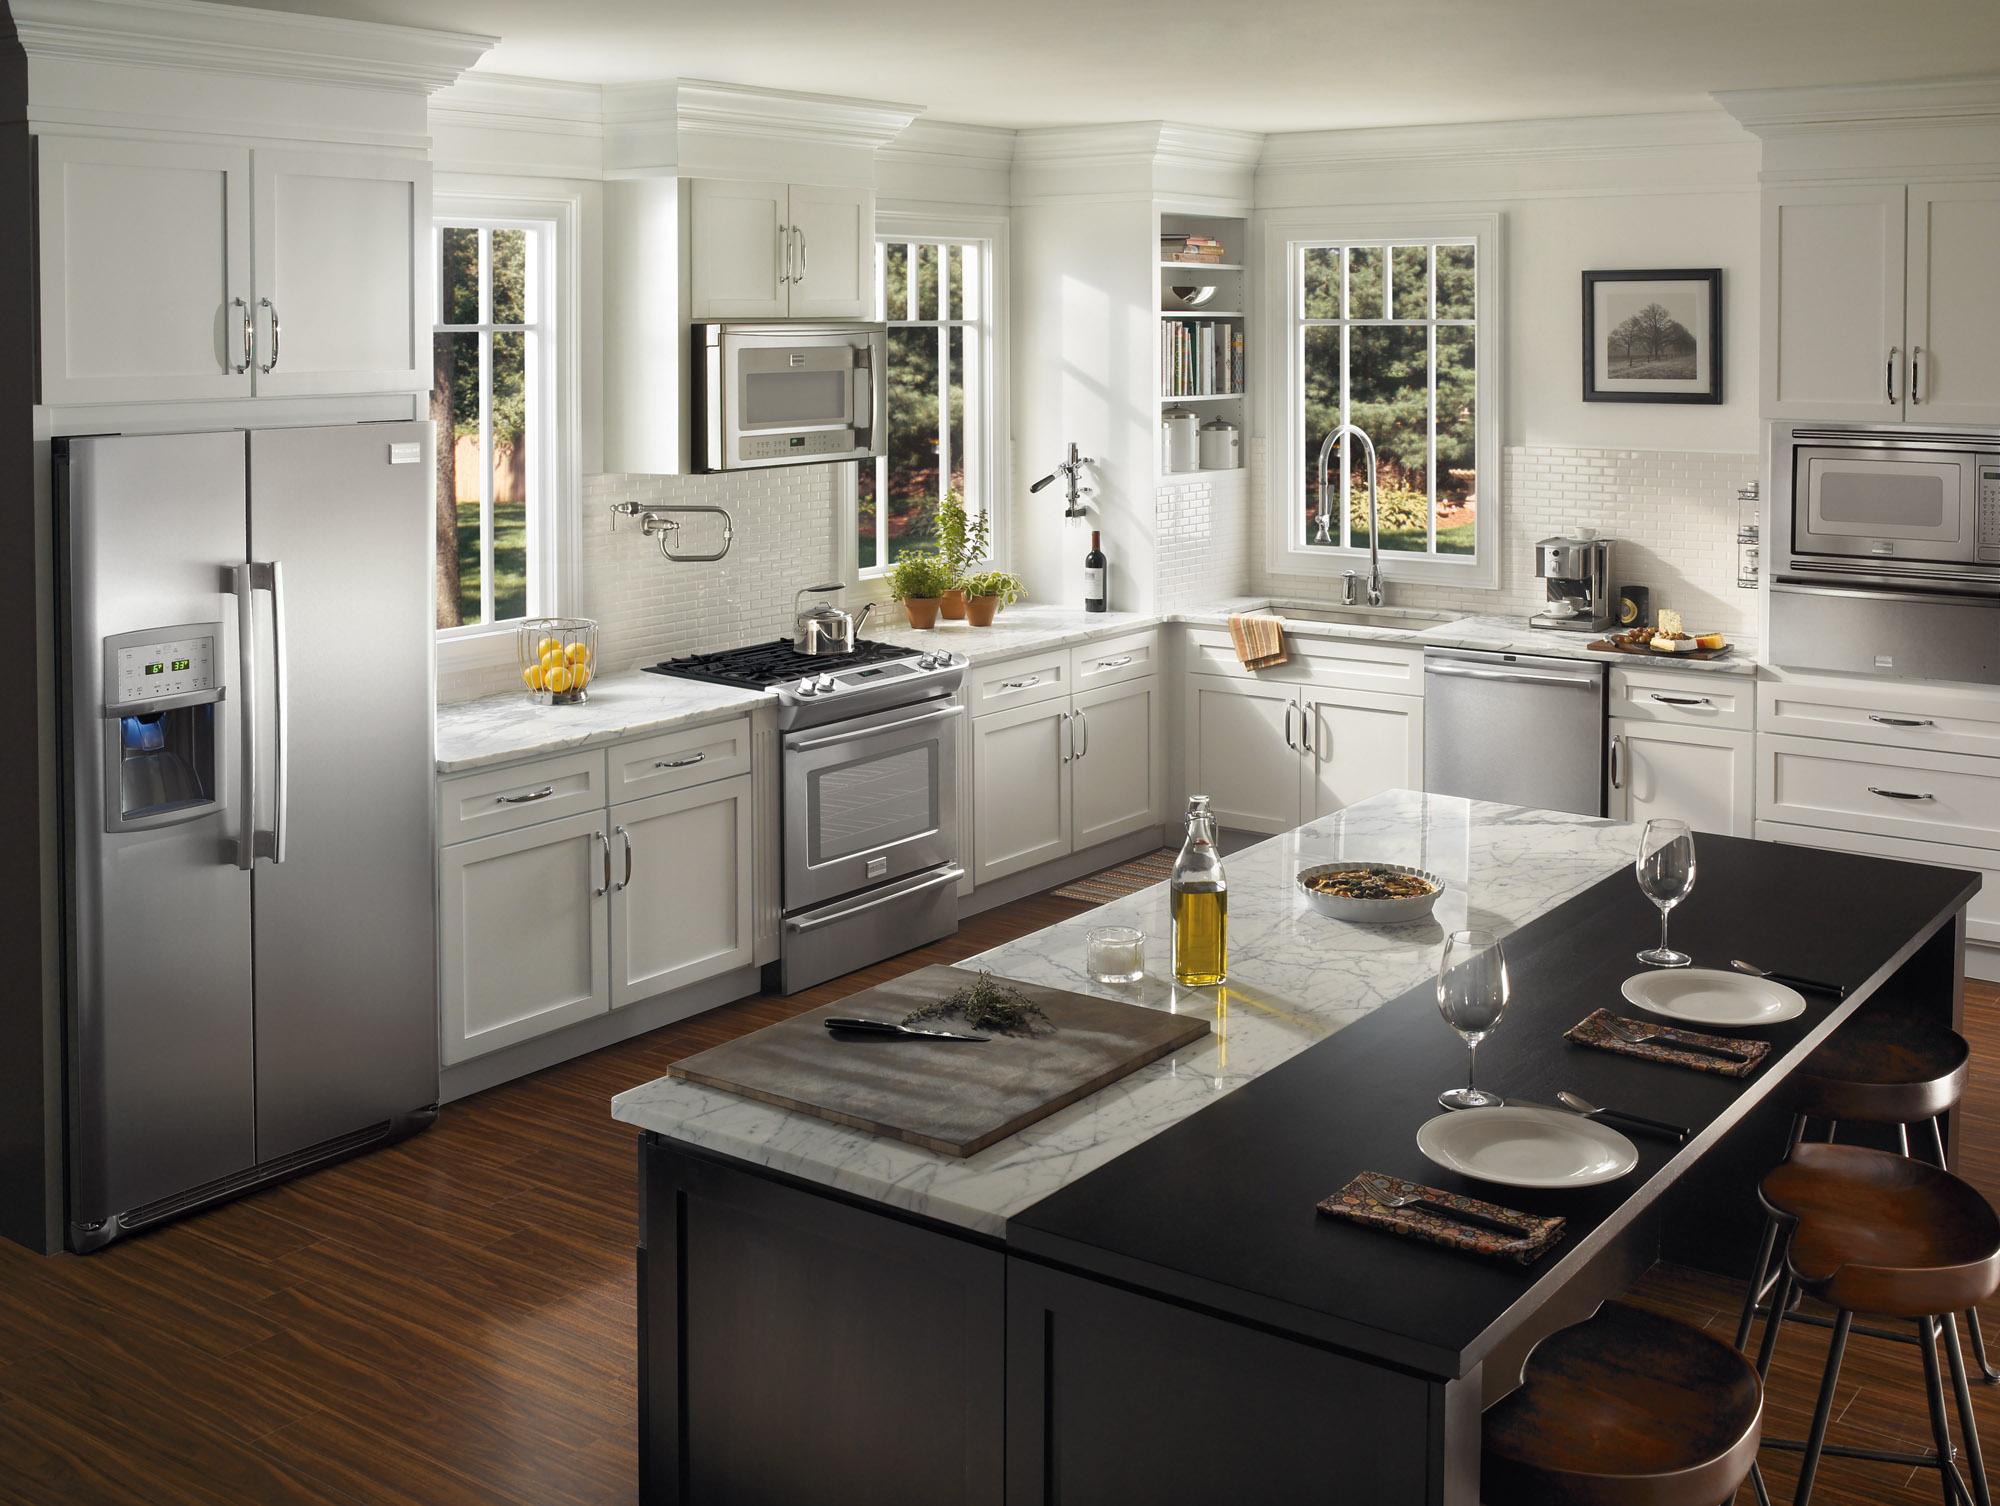 Kitchen Renovations Melbourne | Lonibuild Carpentry | Best ... on Kitchen Renovation Ideas  id=22556